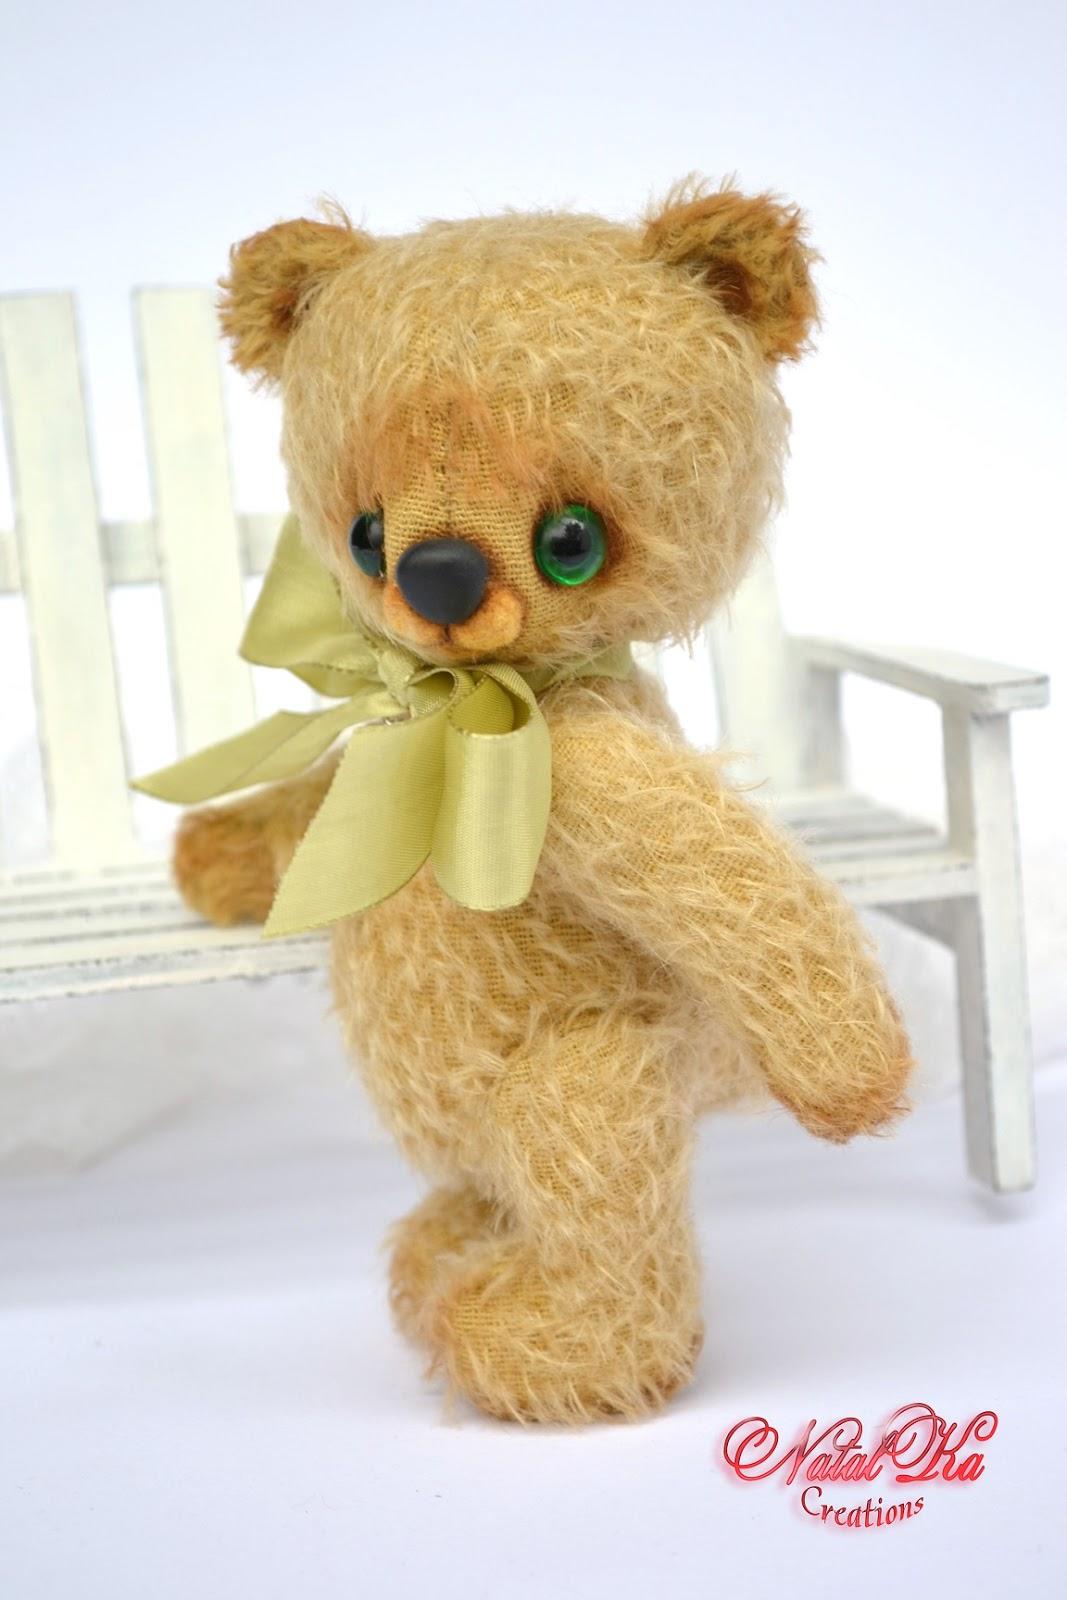 Авторский мишка тедди медведь медвежонок из мохера от NatalKa Creations. Künstlerbär Teddybär Bär Teddy handgefertigt von NatalKa Creations.